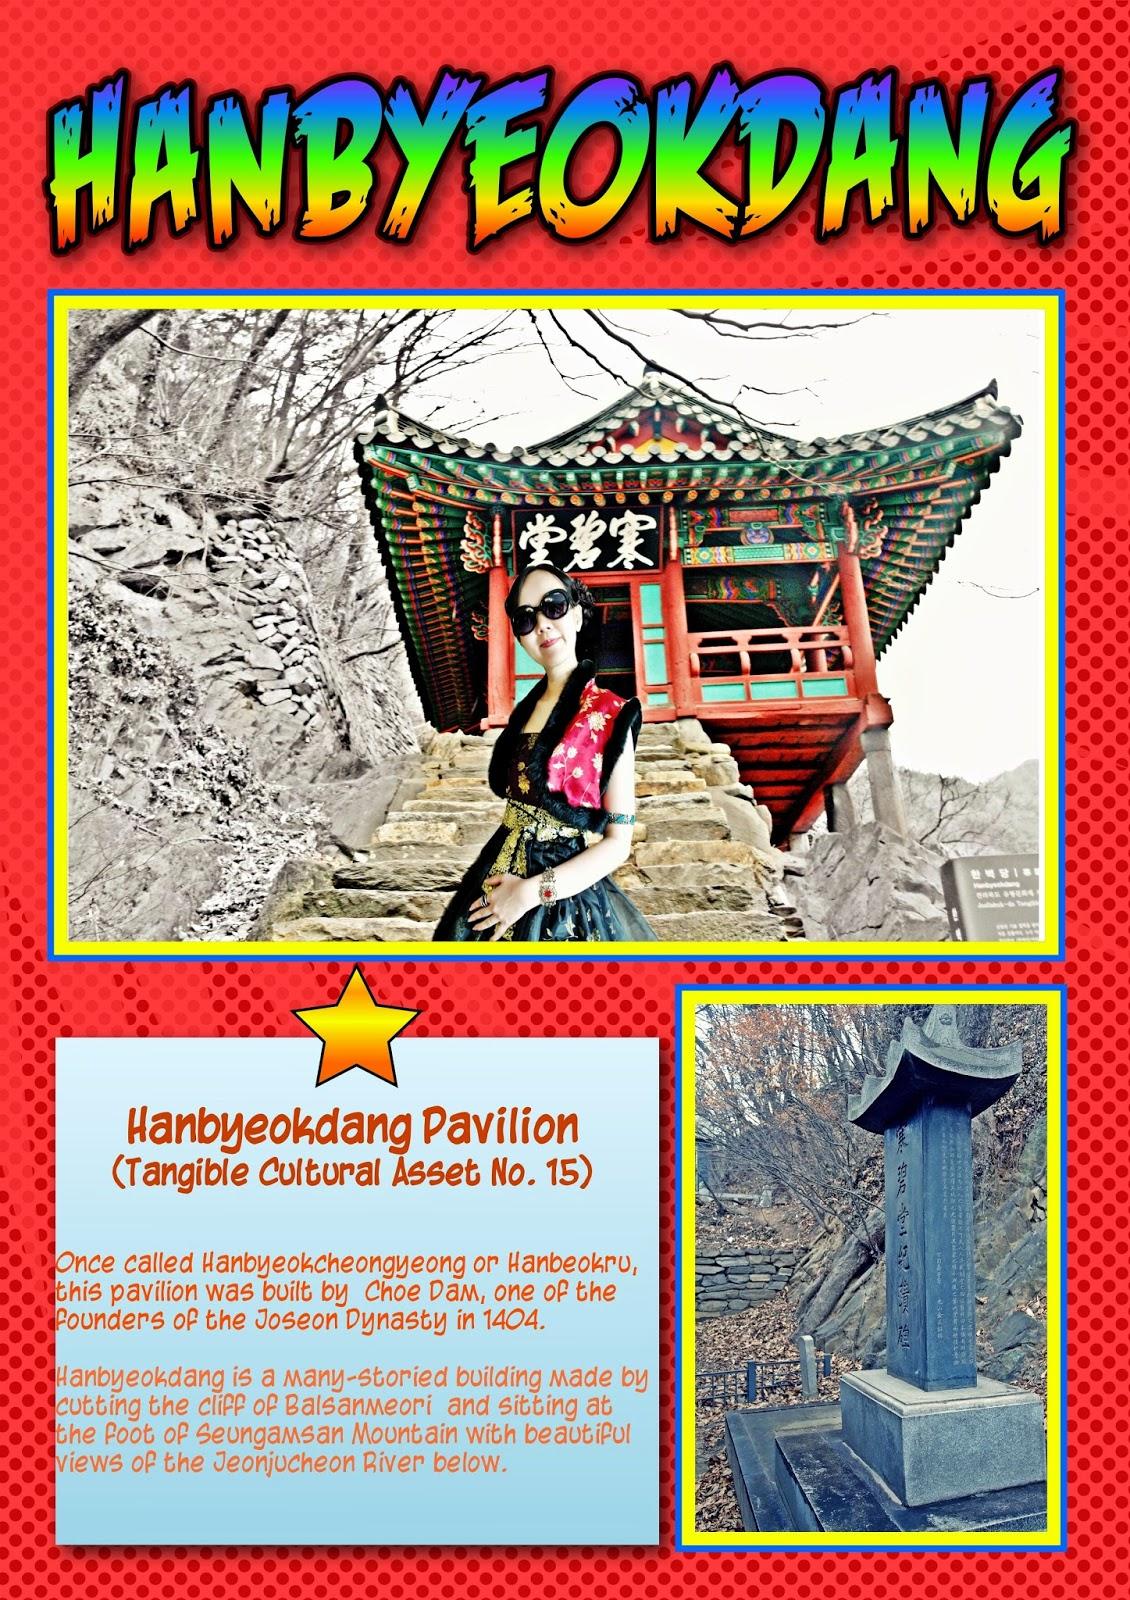 Must visit: Jeonju Hanbyeokdang Pavilion 한벽당 | meheartsoul.blogspot.com